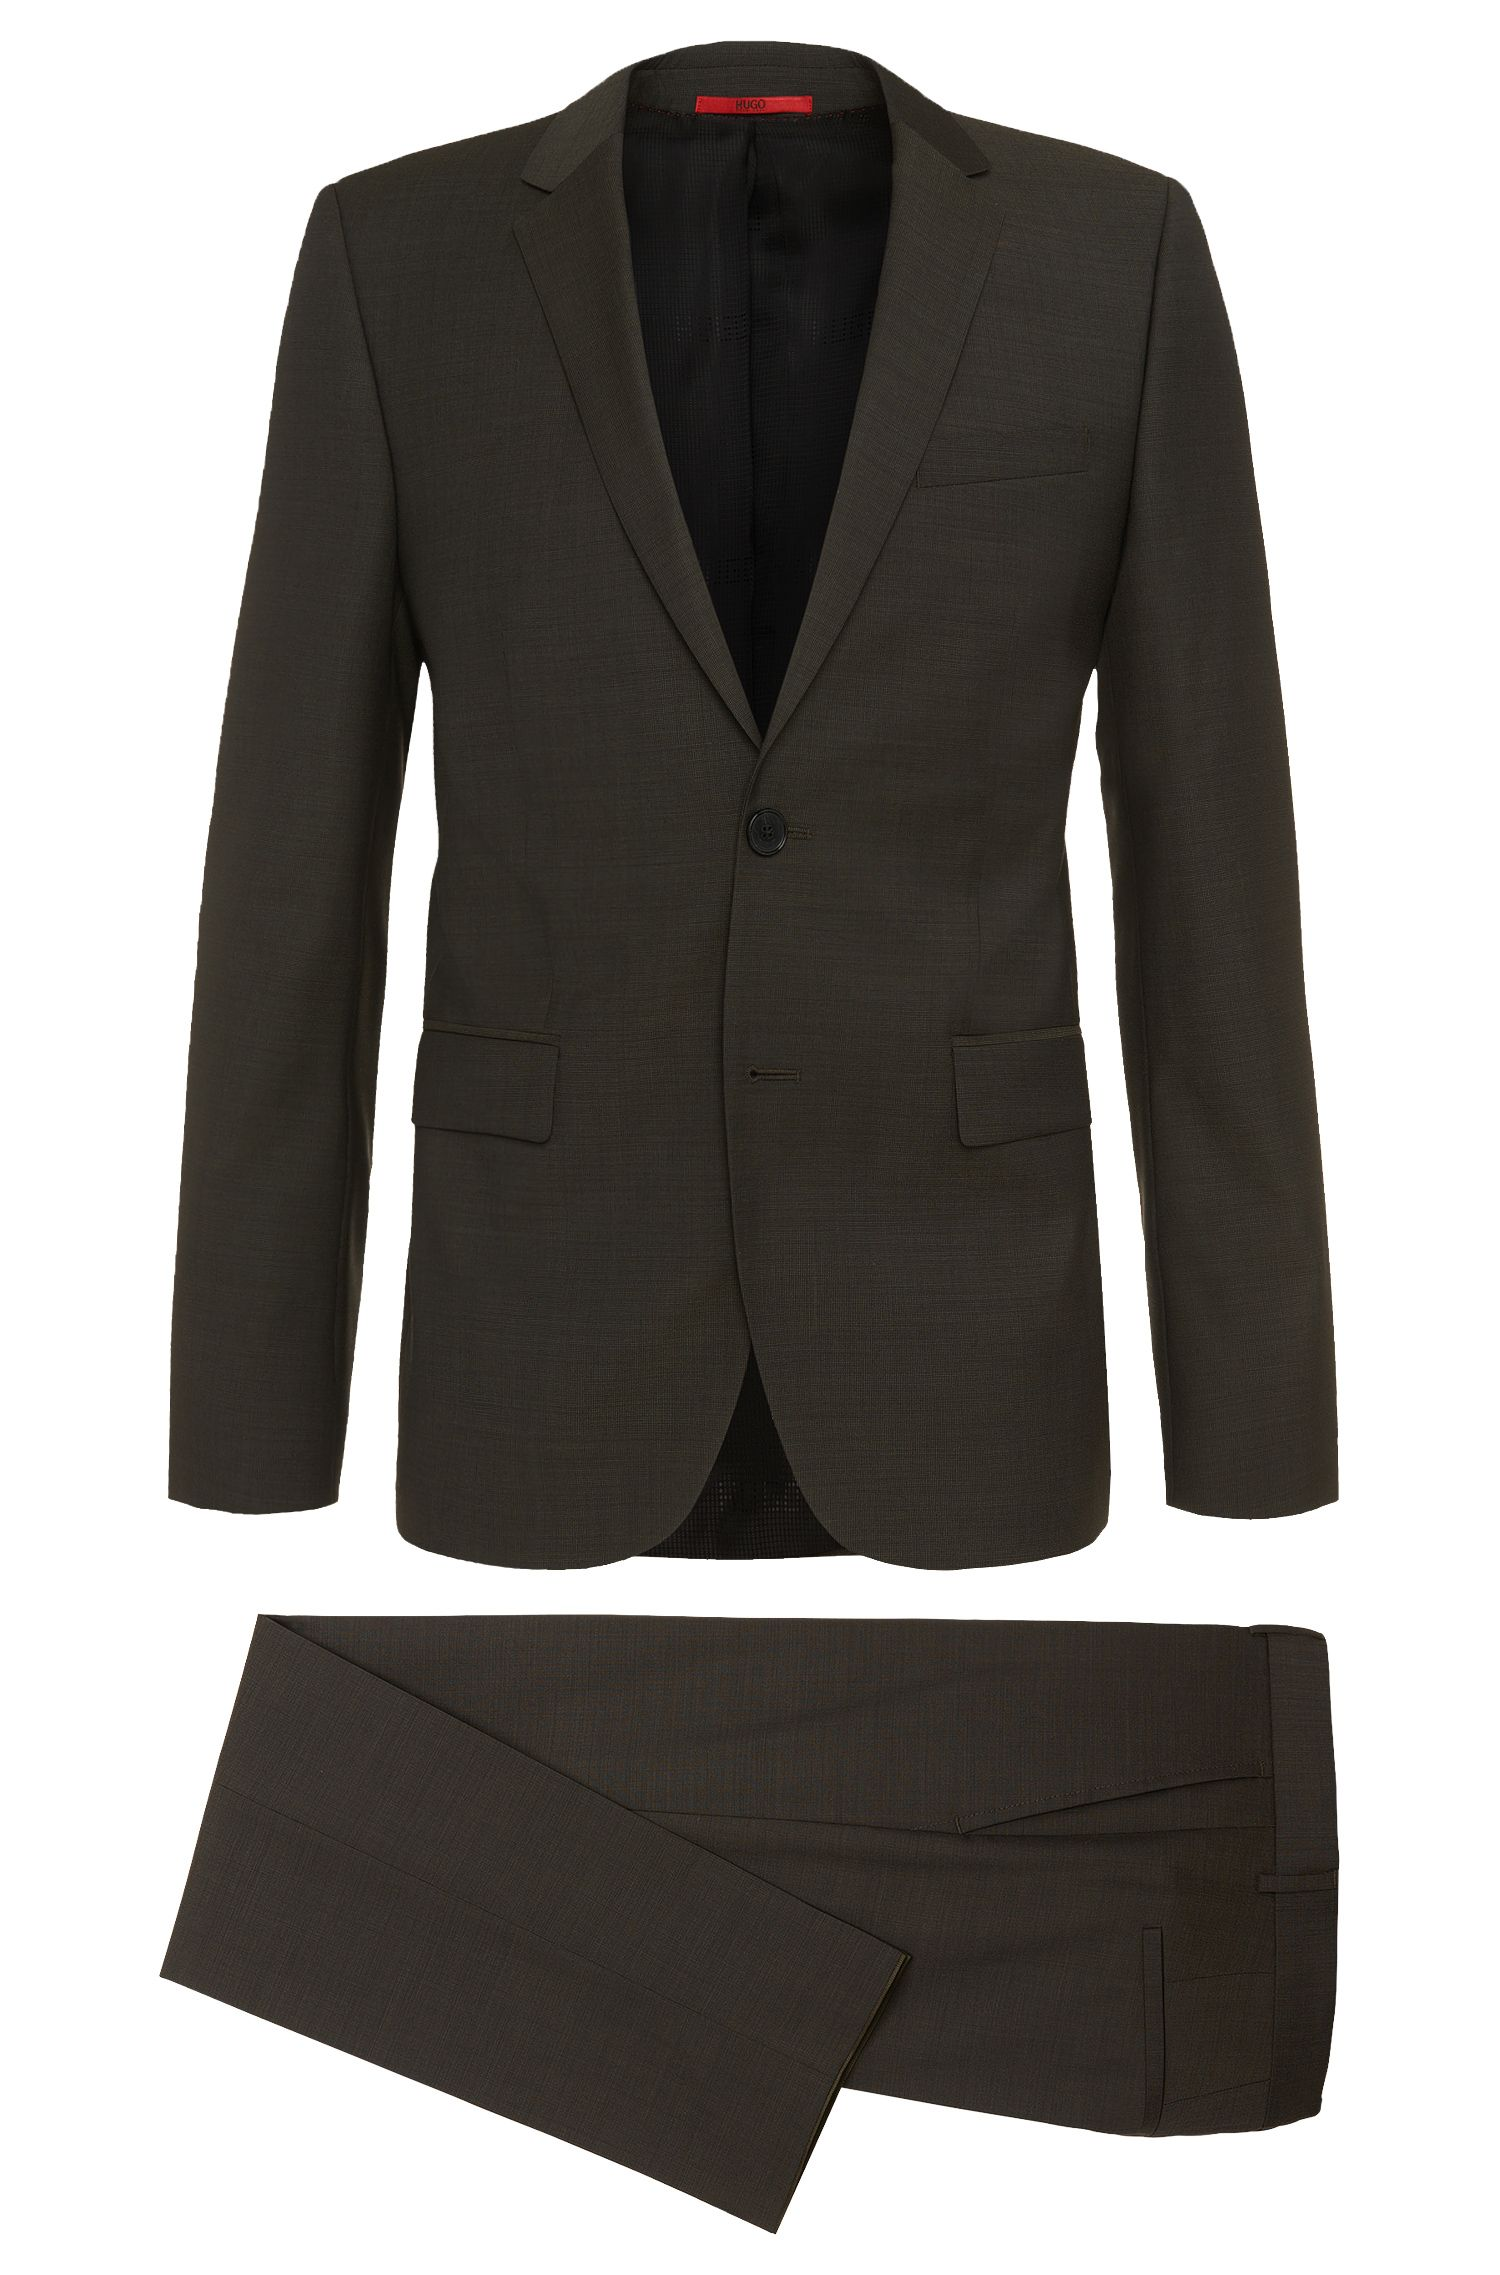 Nailhead Super 100 Virgin Wool Suit, Slim Fit | Aeron/Hamen